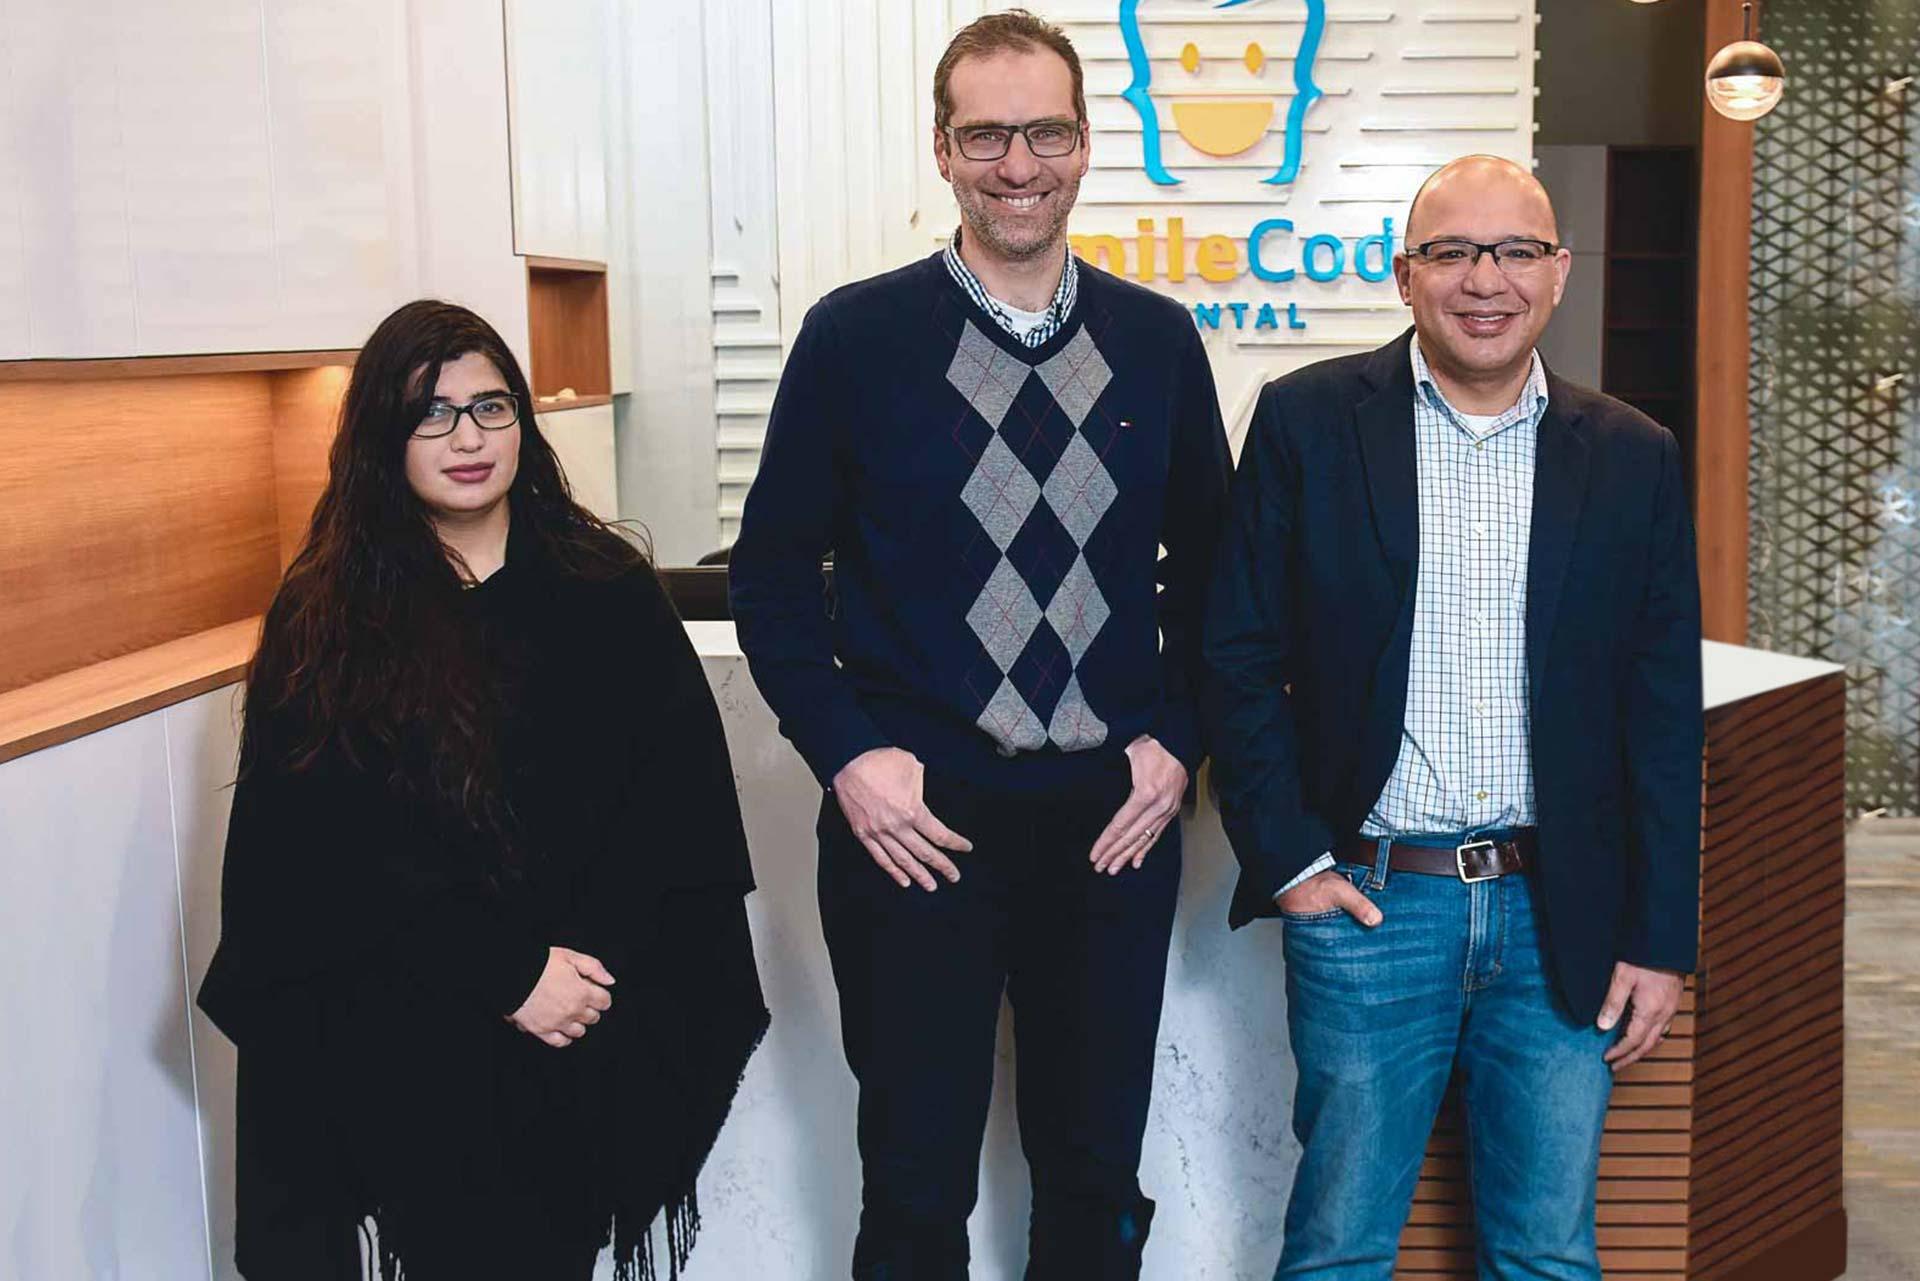 Meet the Team | SmileCode Dental | NW Calgary | General Dentist